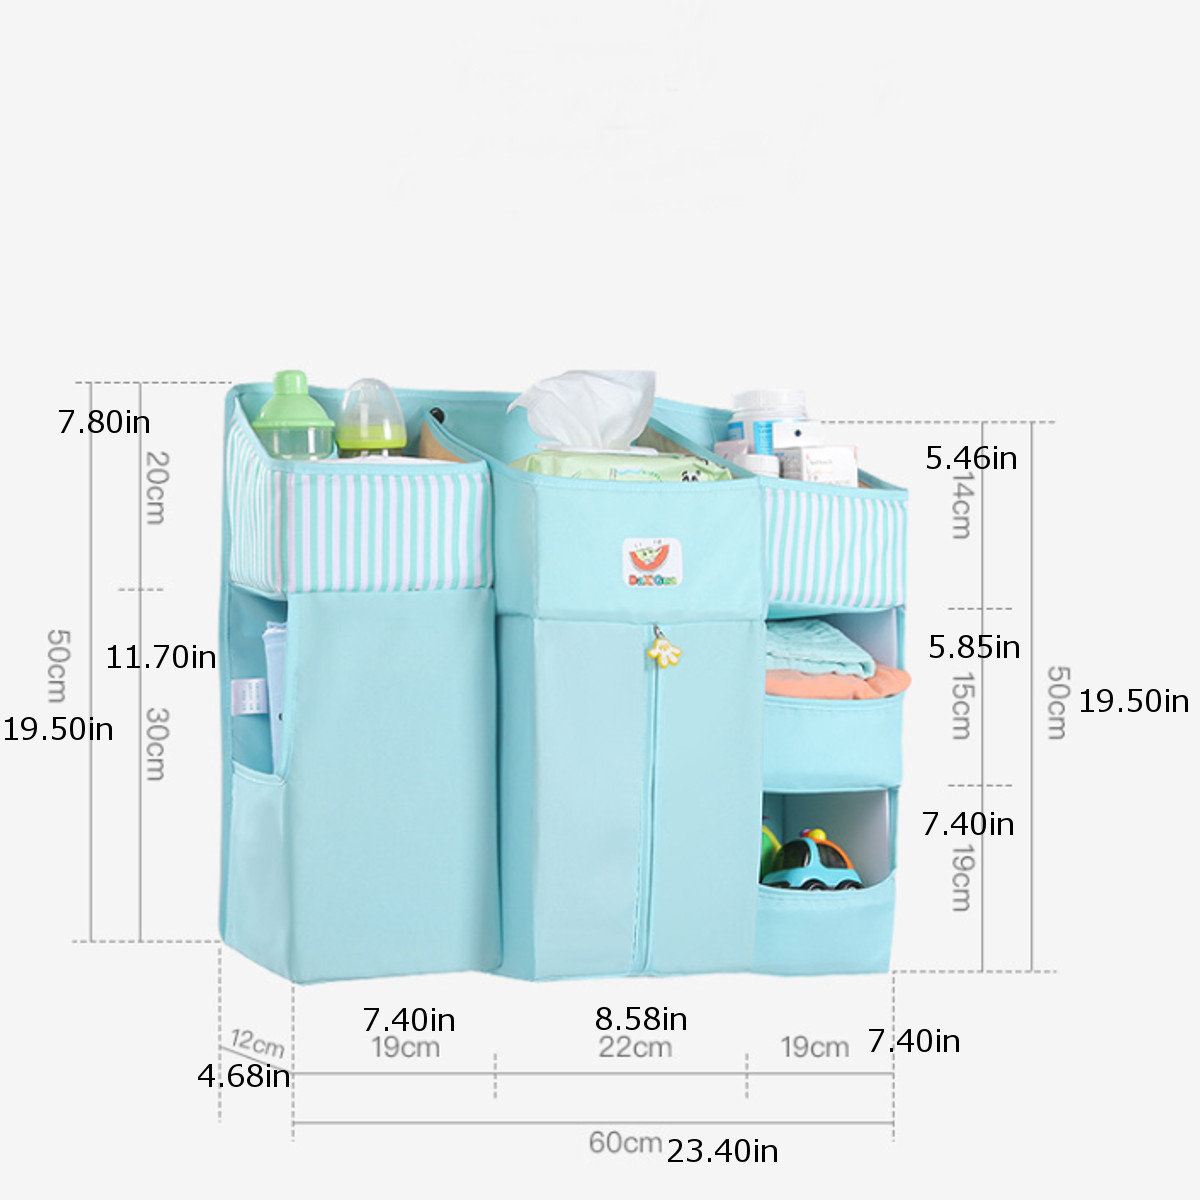 Portable Baby Crib Organizer Bed Hanging Bag for Baby Essentials Diaper Storage Cradle Bag Crib Bedding